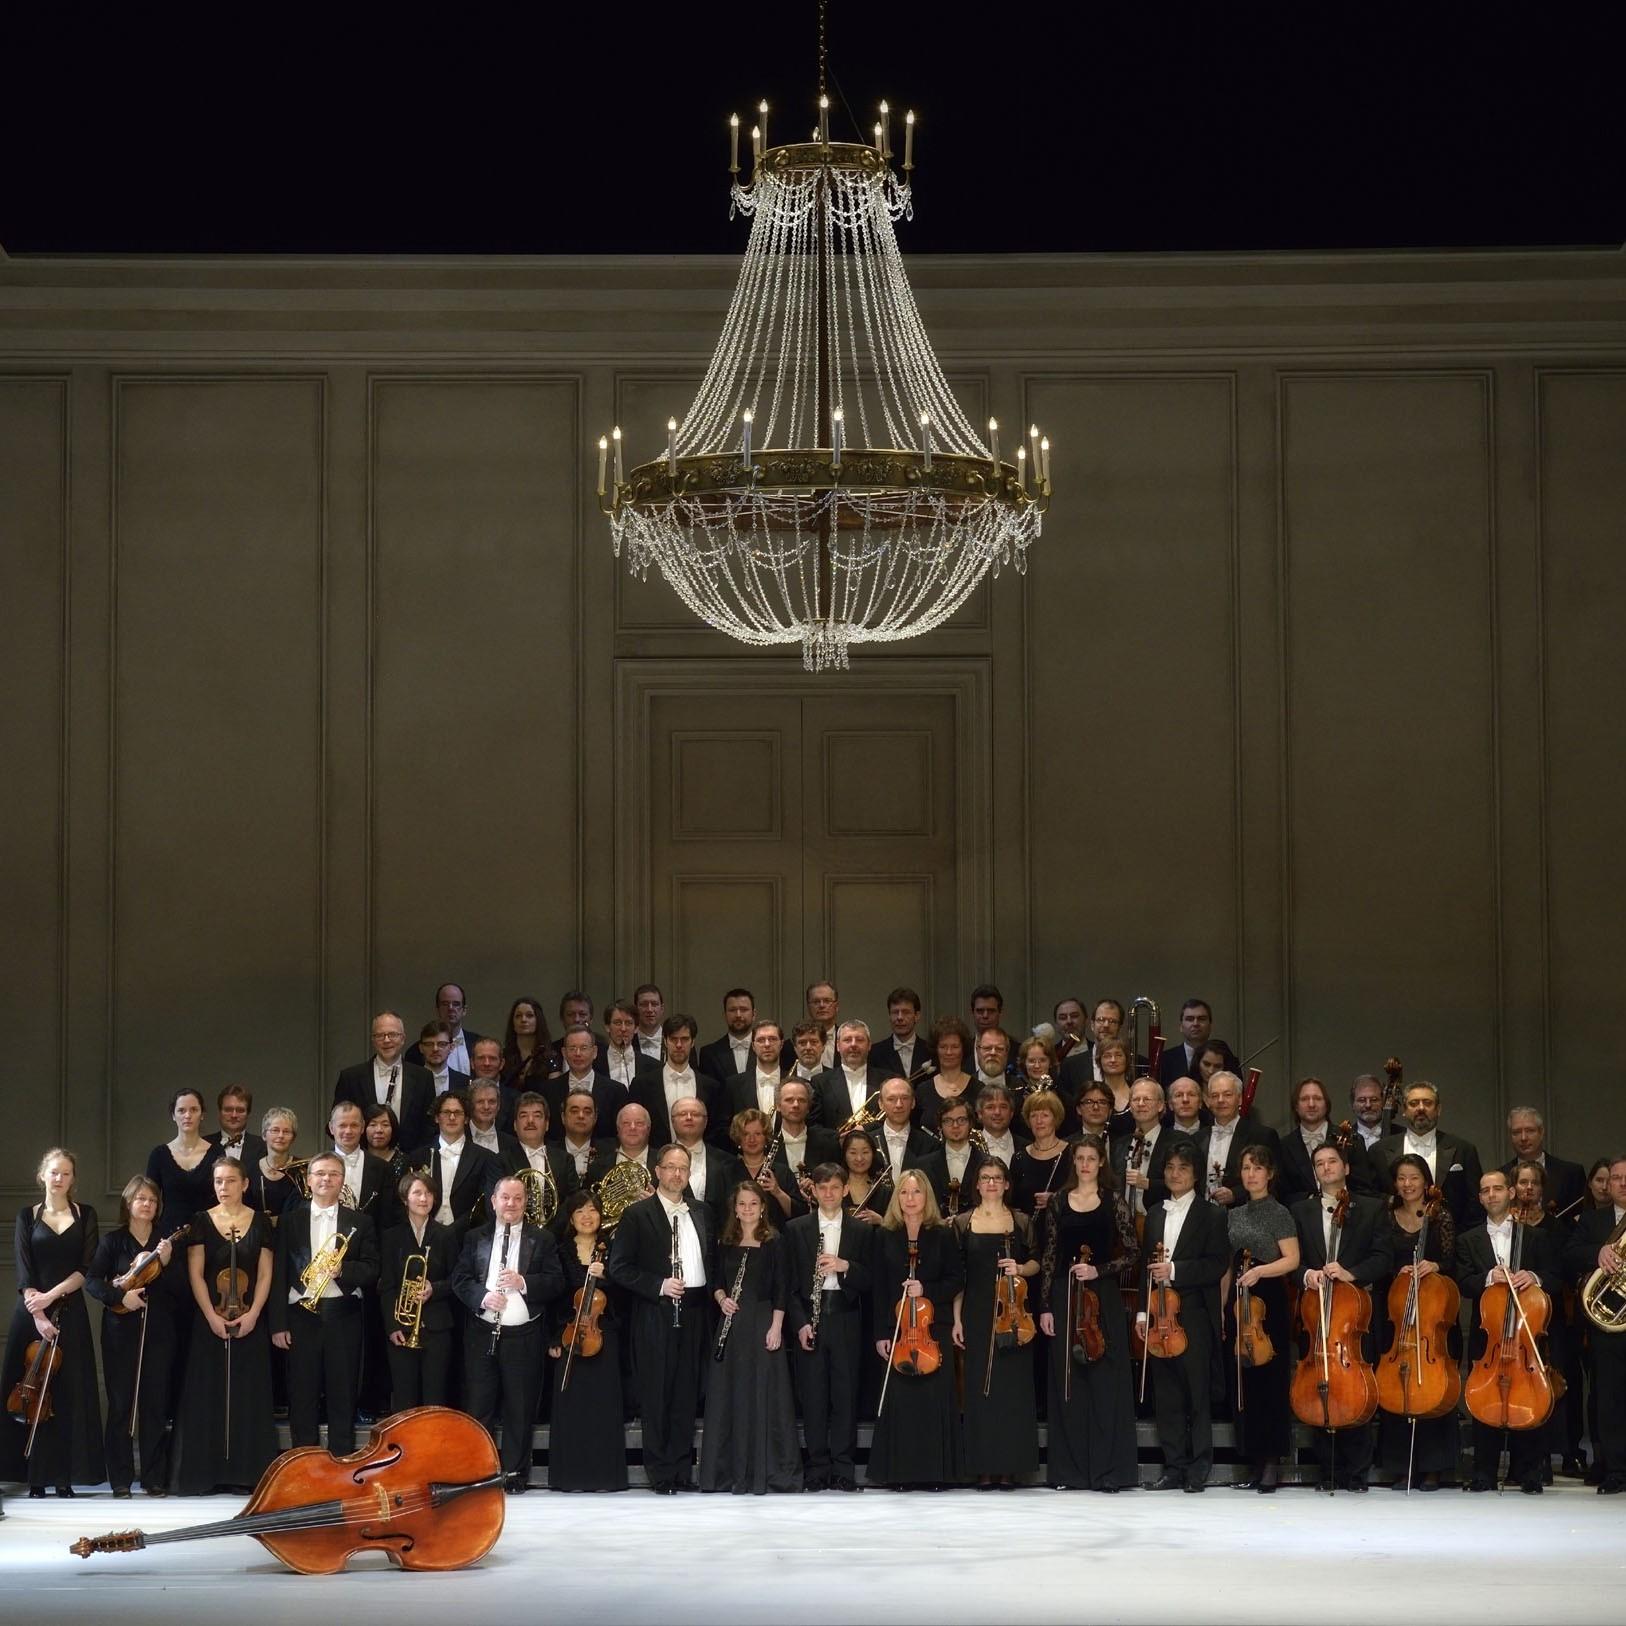 Magdeburgische Philharmonie © Nitz-Boehme